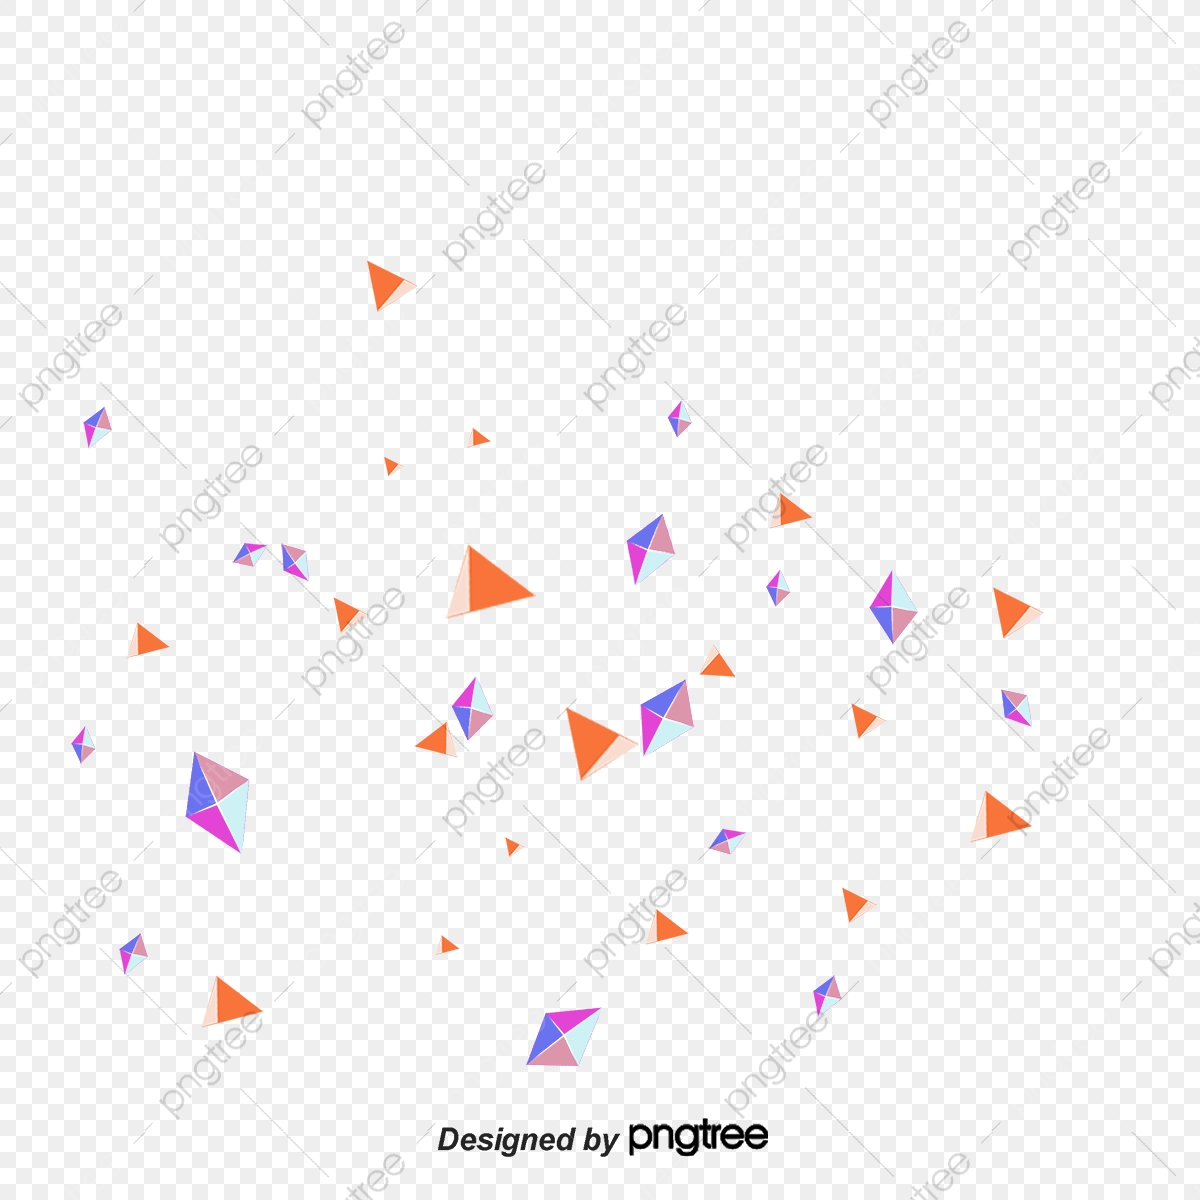 Confetti, Scrap, Scraps Of Paper PNG Transparent Clipart.